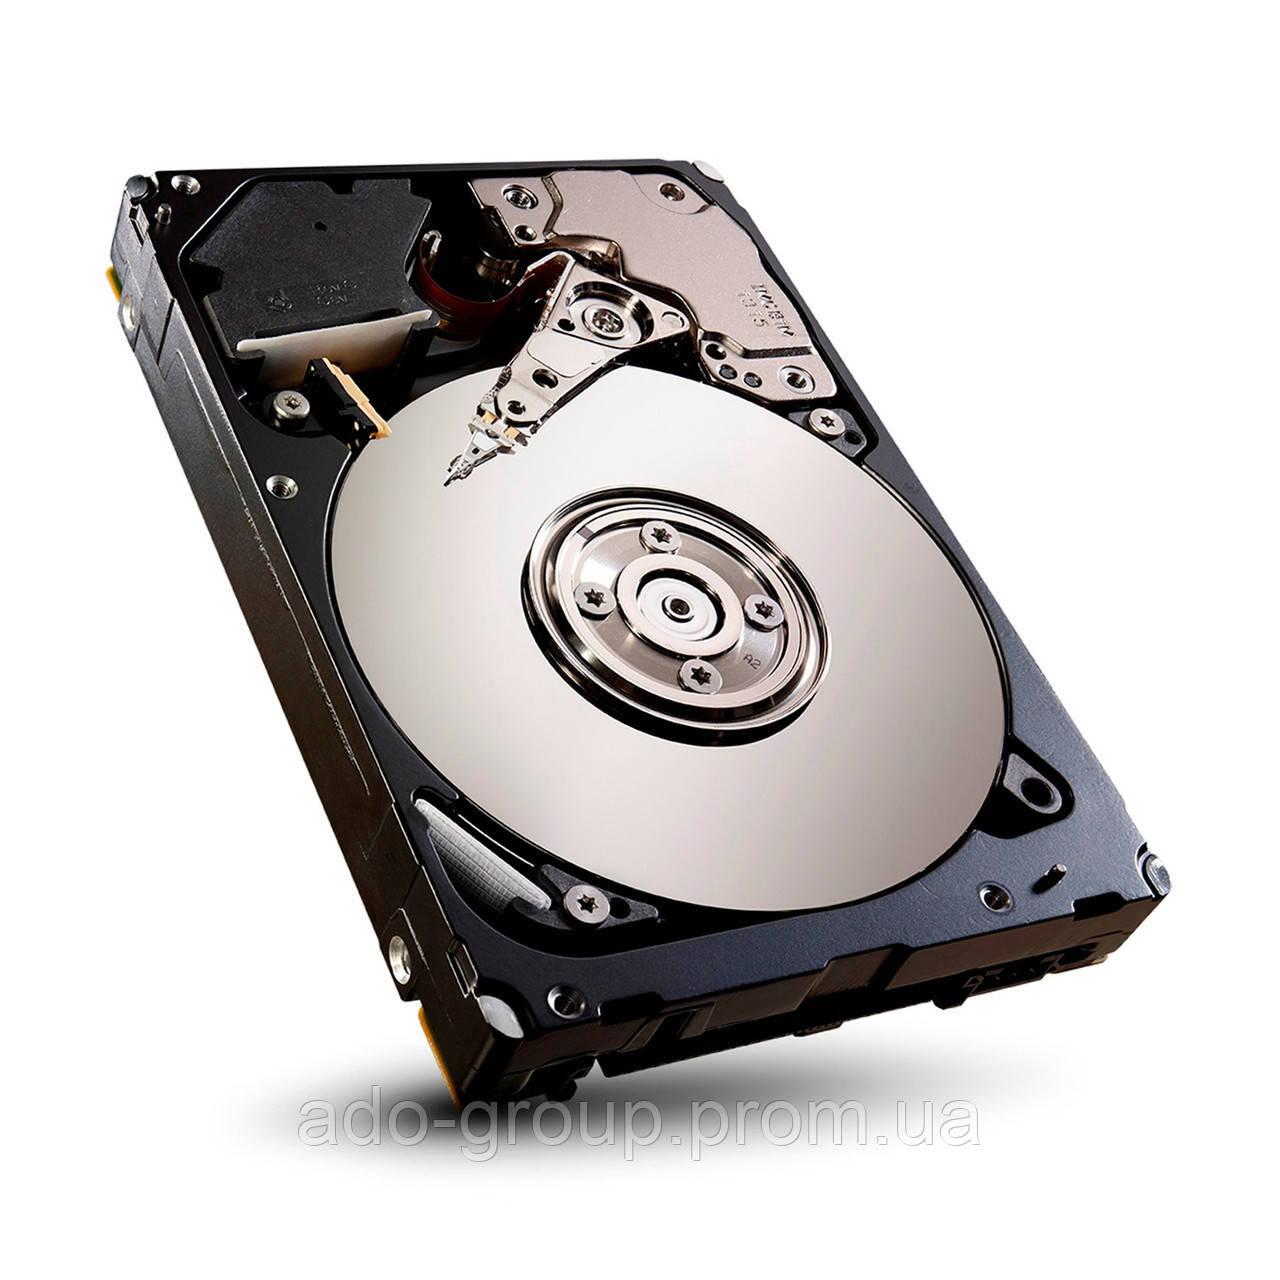 "00FN158 Жесткий диск IBM 5000GB SATA 7.2K  3.5"" +"